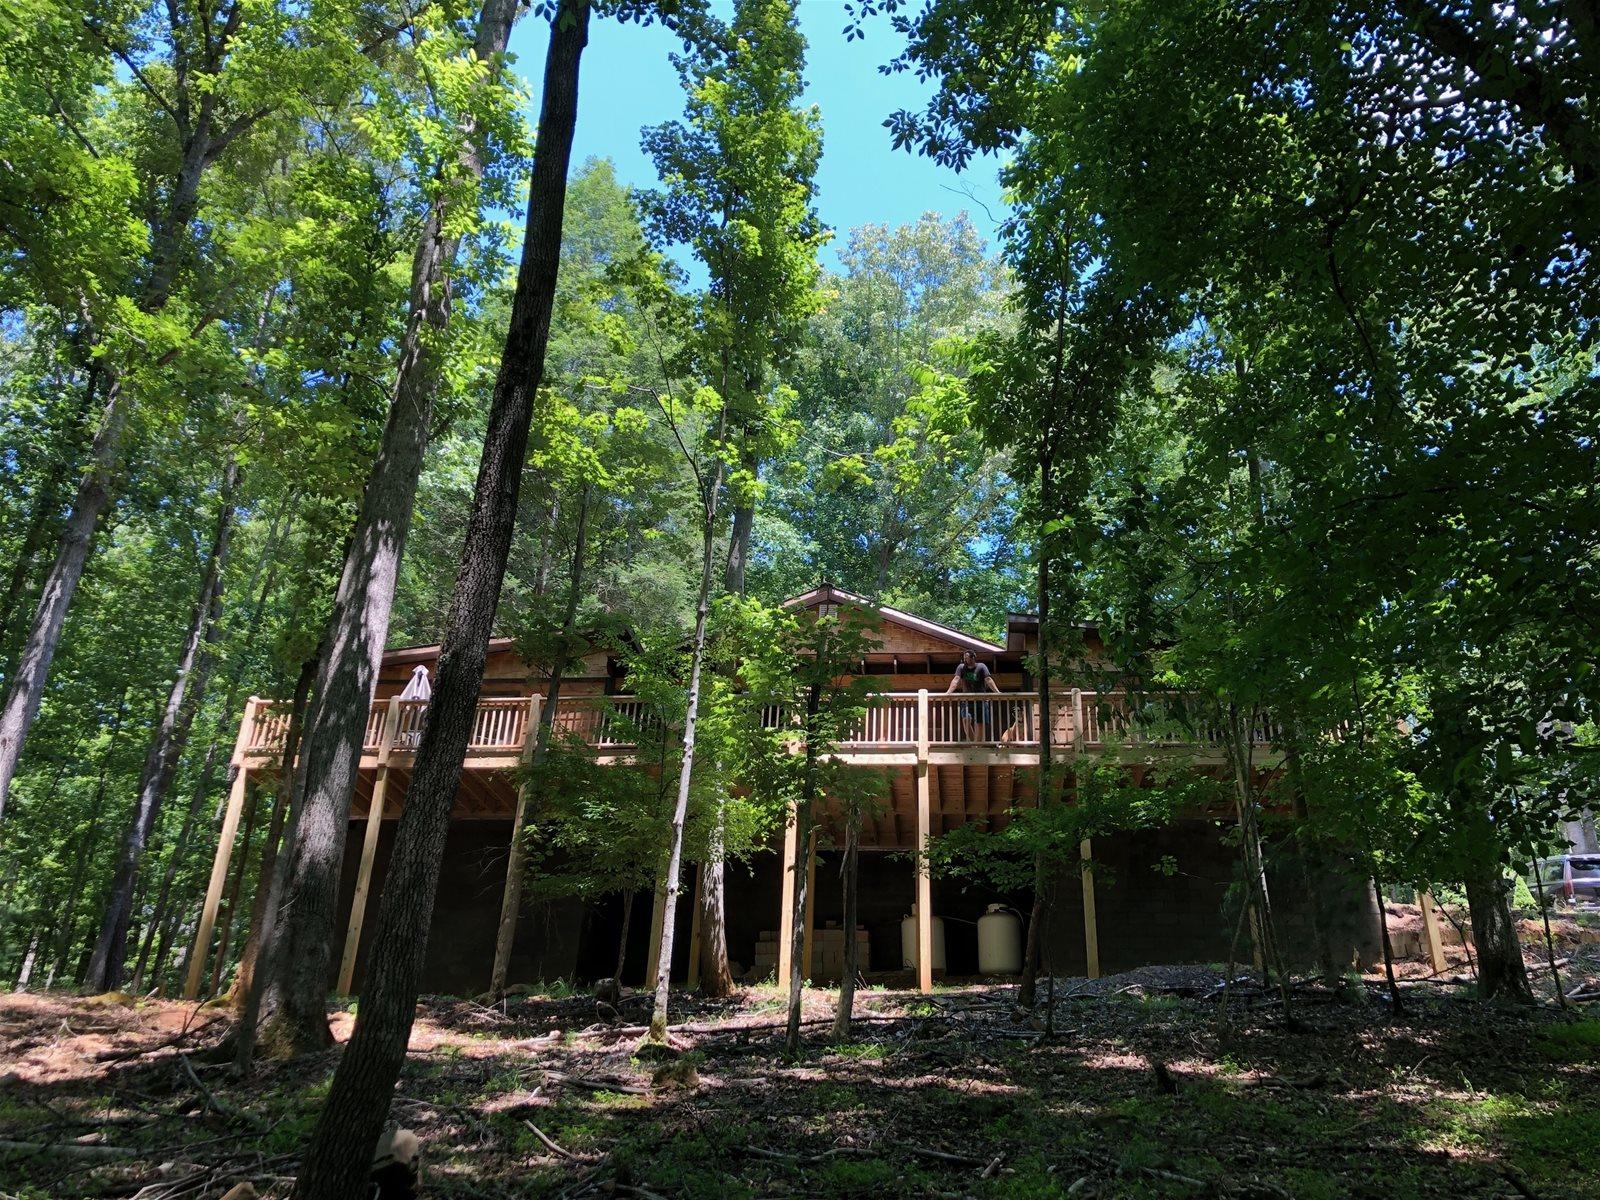 Treetops Retreat A Rustic Retreat In North Georgia That Has A Hot